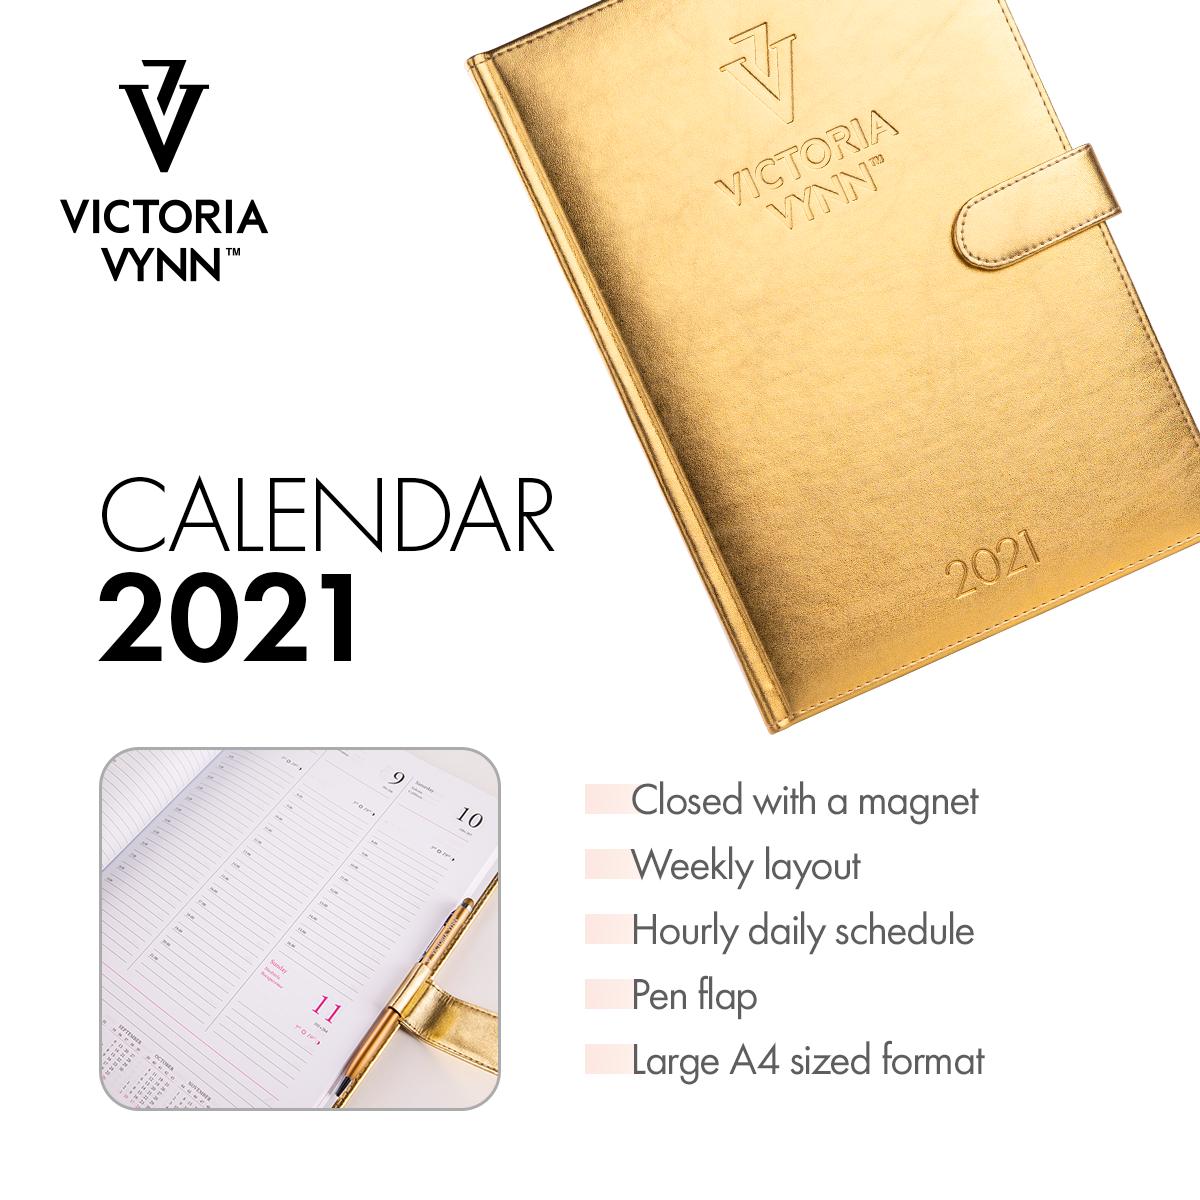 Agenda Victoria Vynn 2021 - Pré-reserva